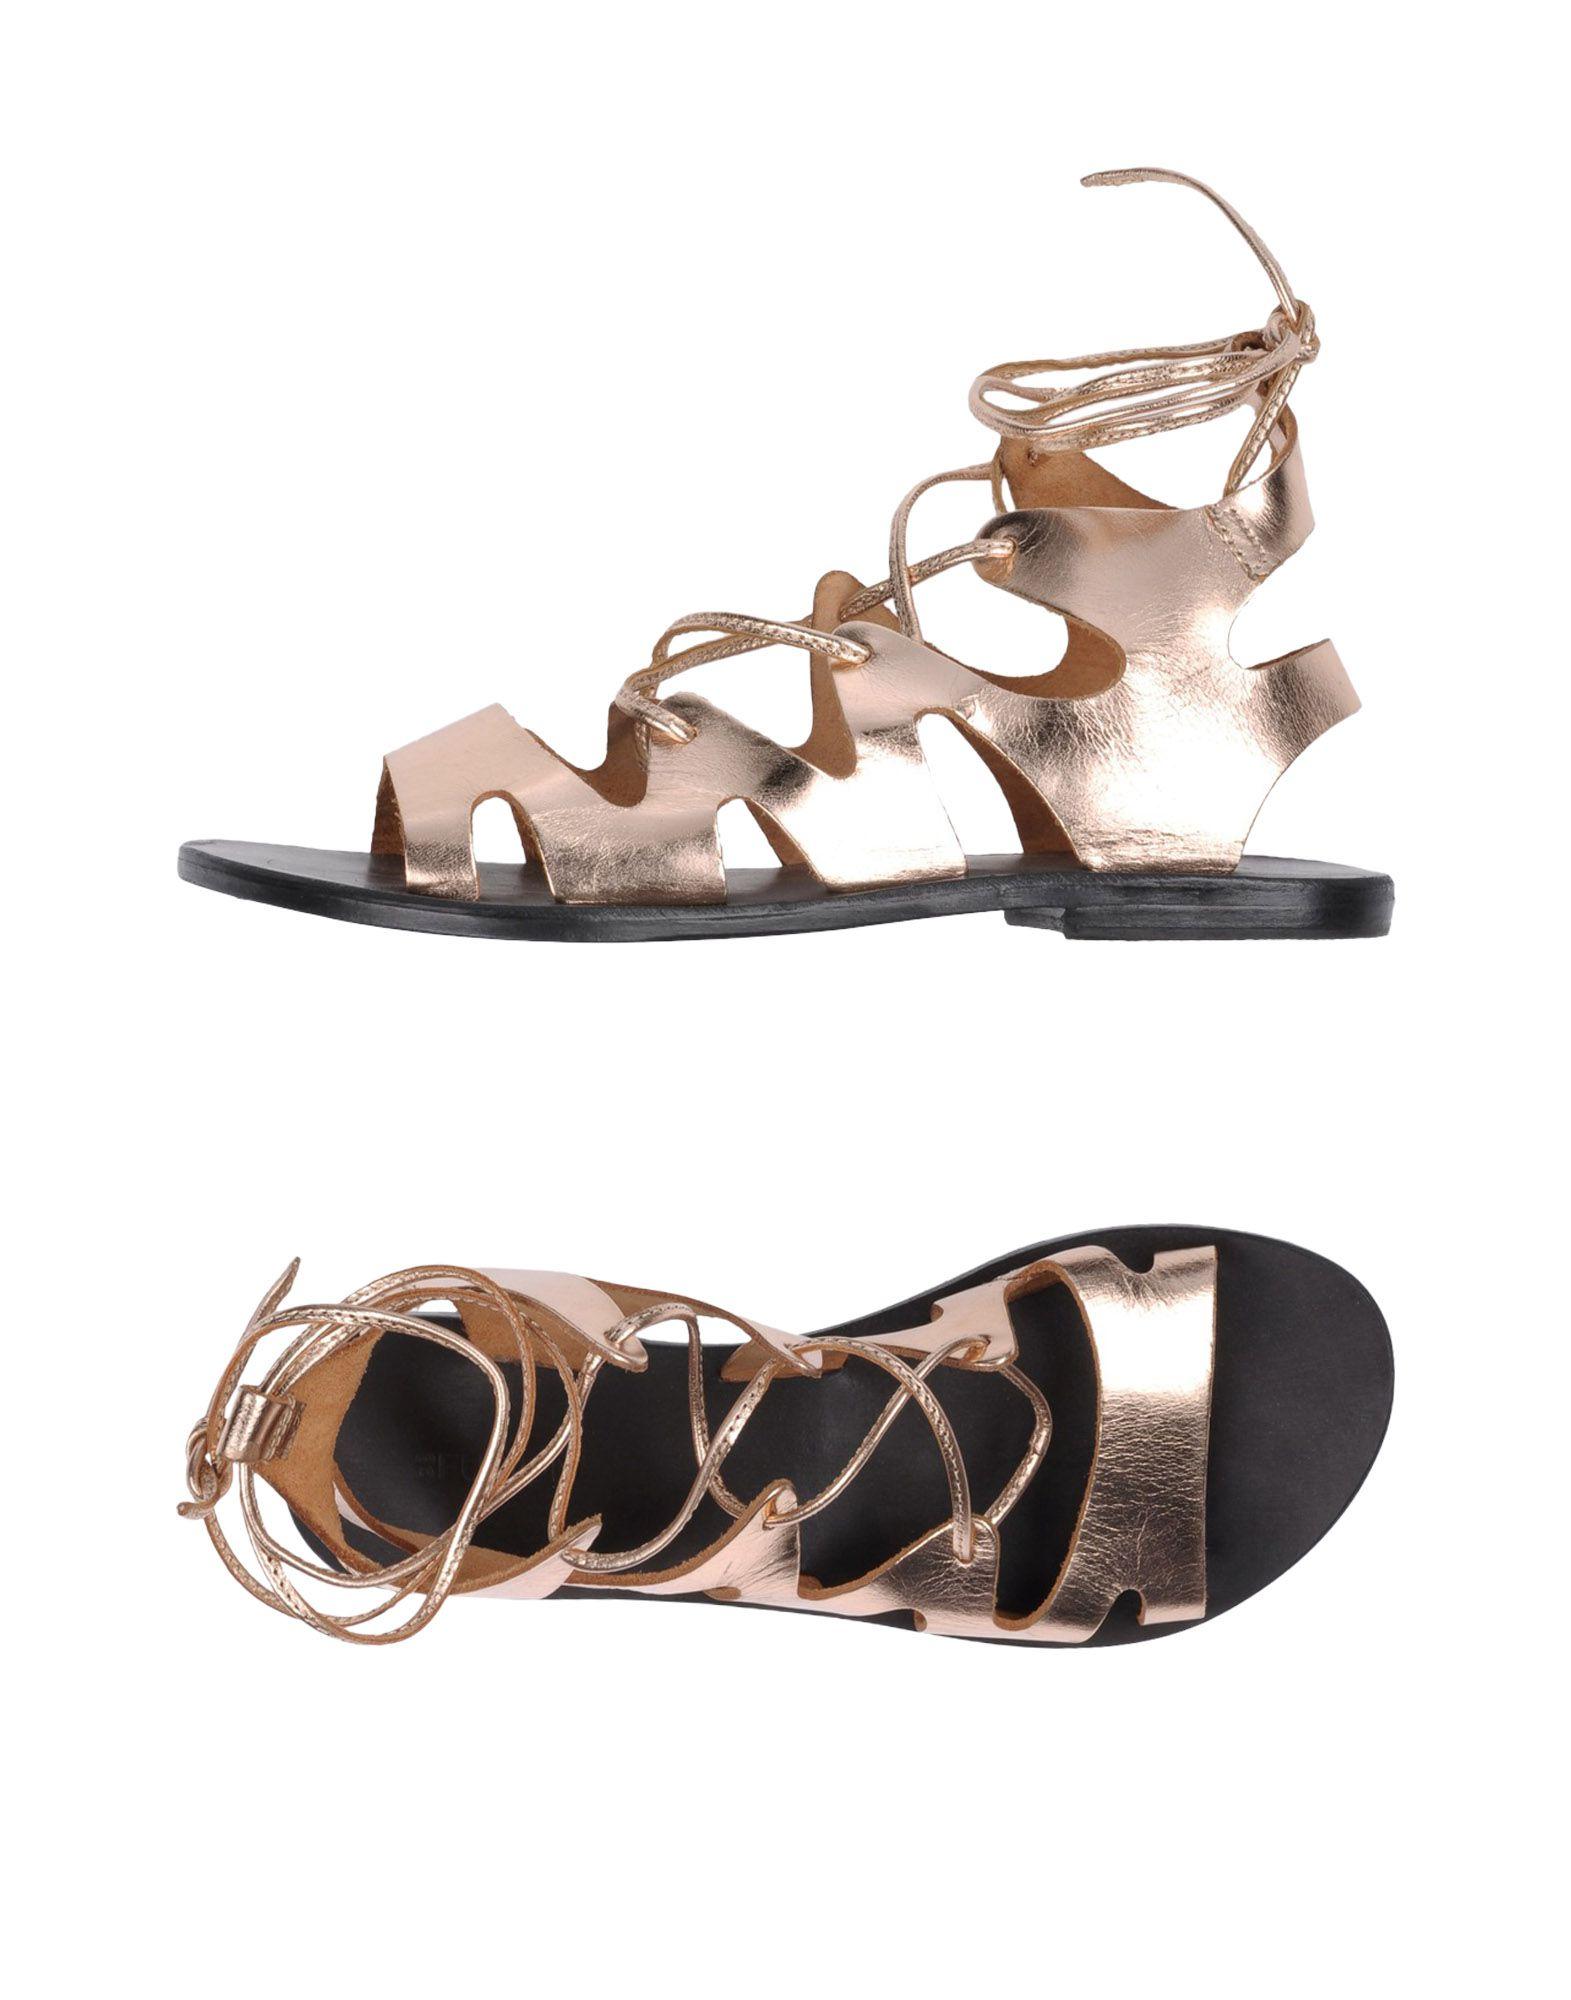 'Cb Fusion Sandals